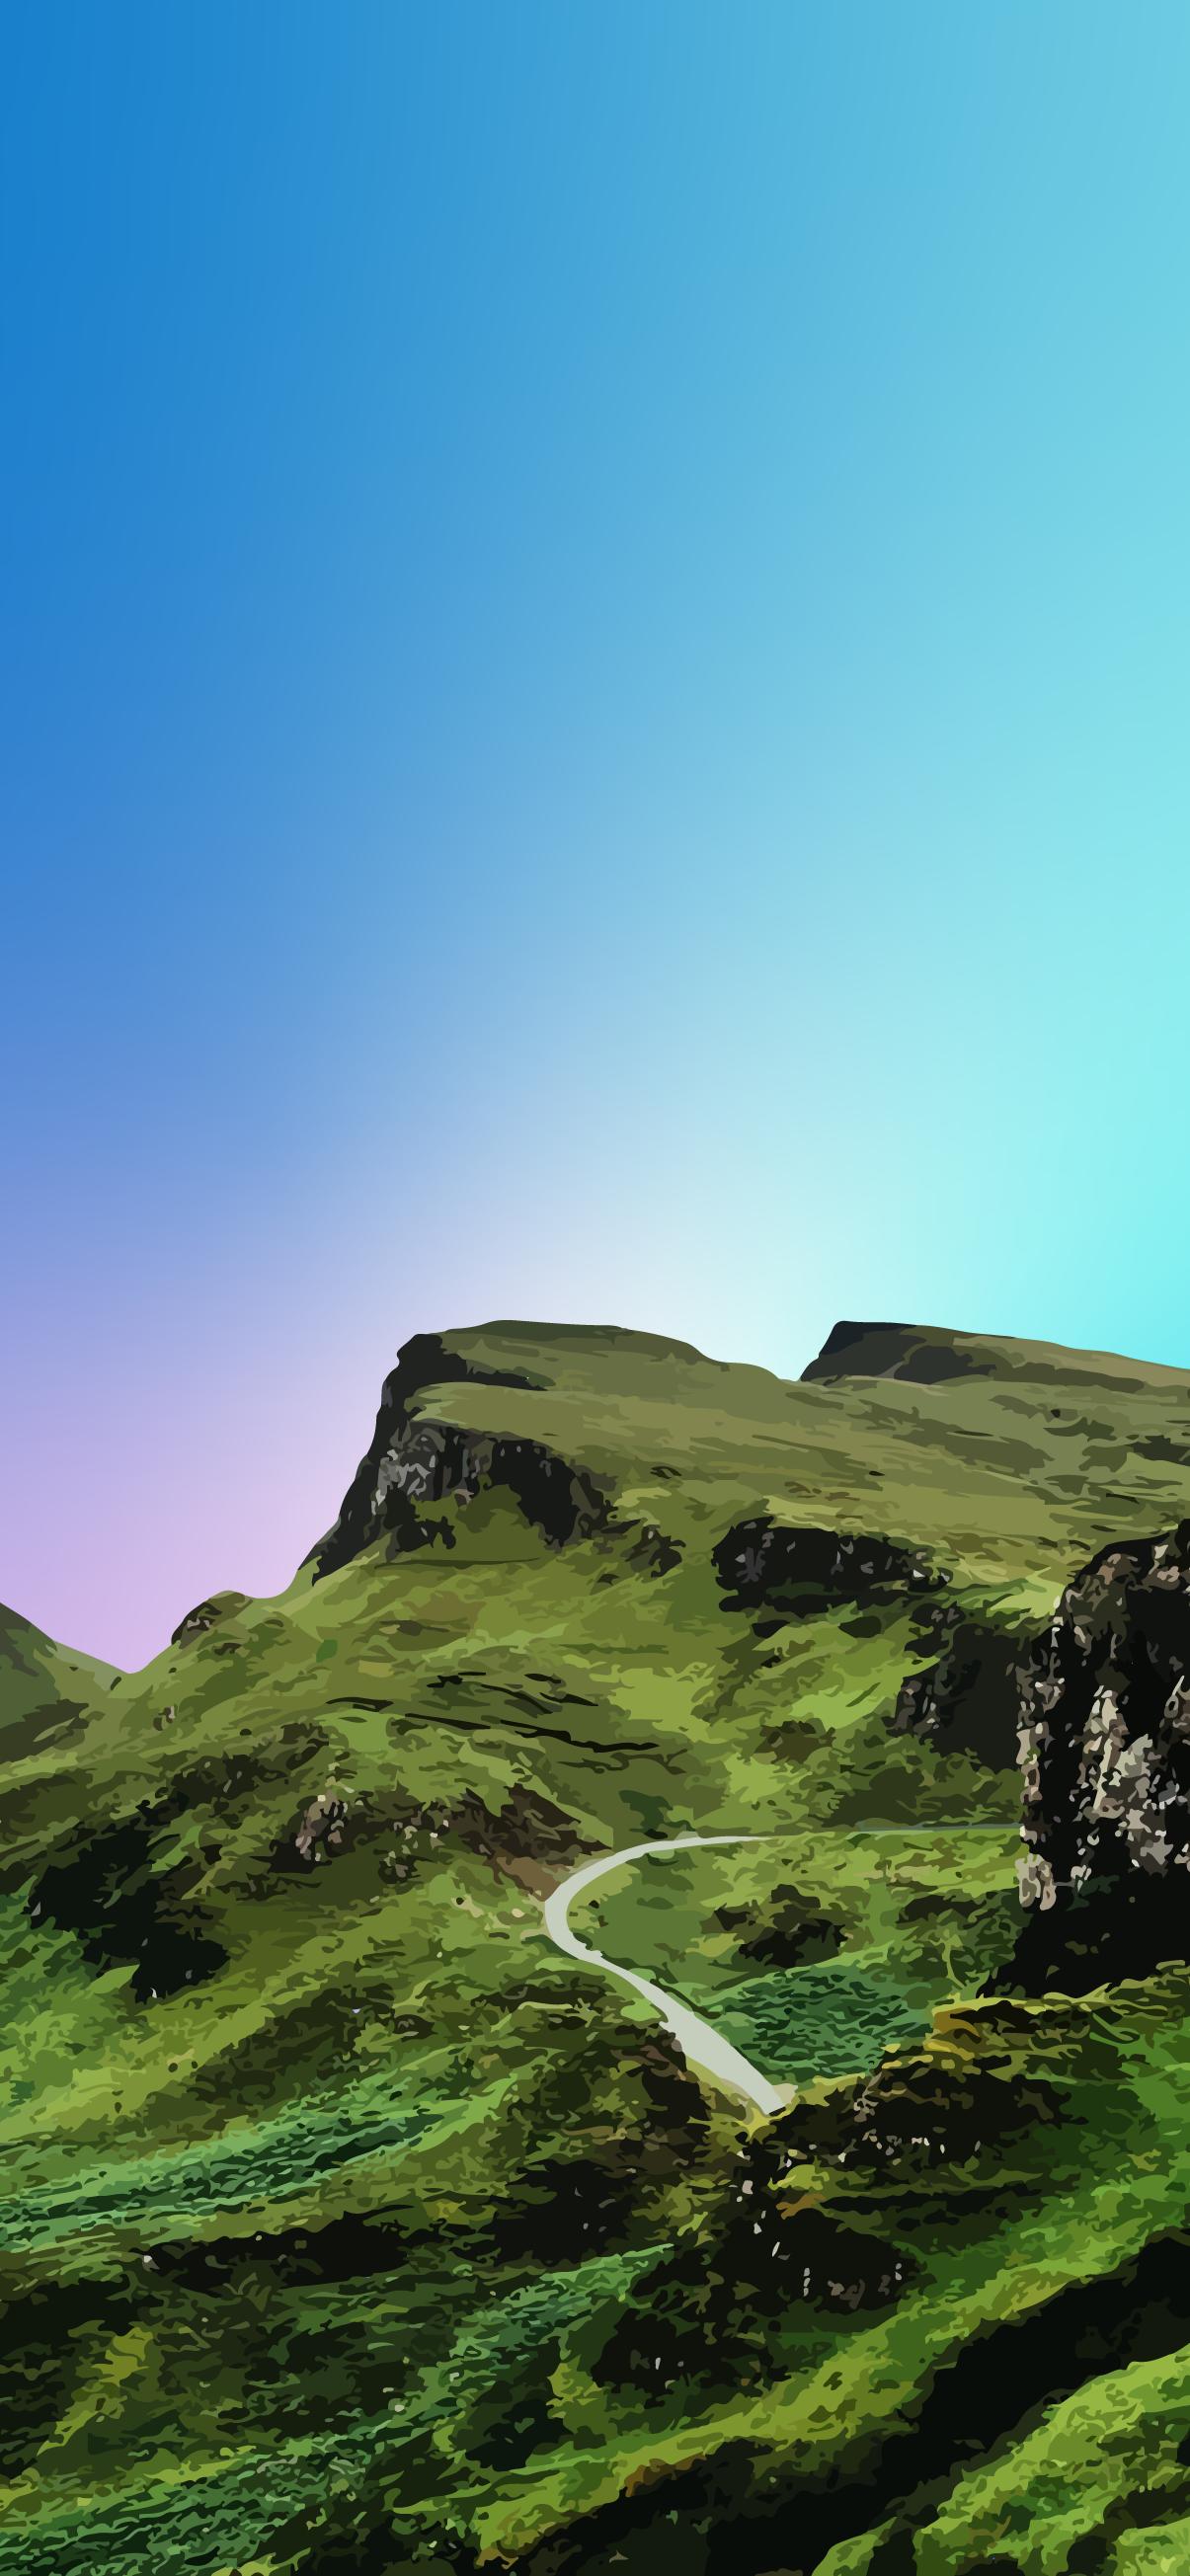 background-wallpaper-iphone-hd-4k